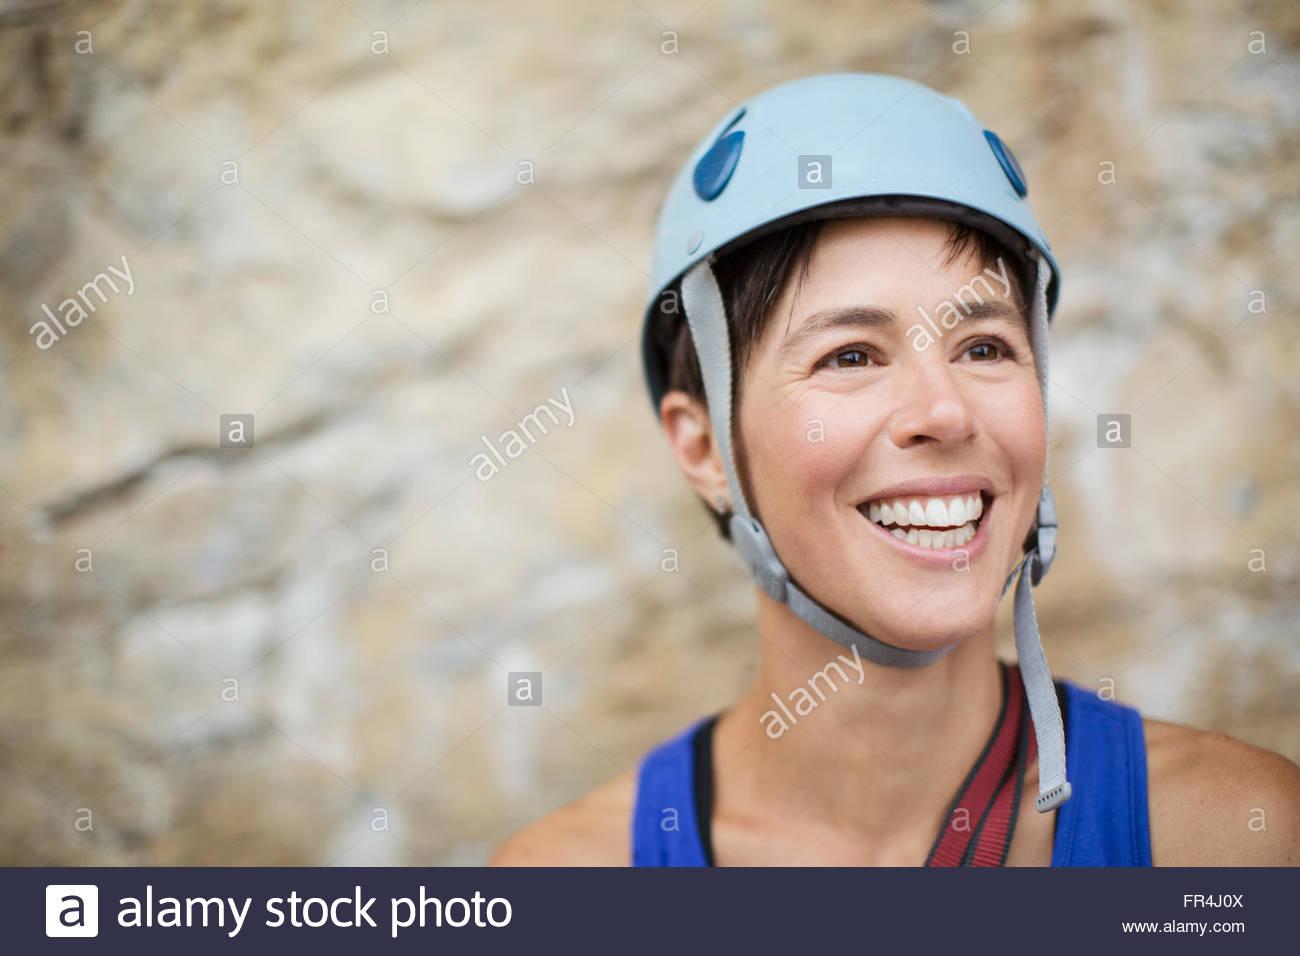 Piuttosto, femmina rocciatore indossando helmut Immagini Stock